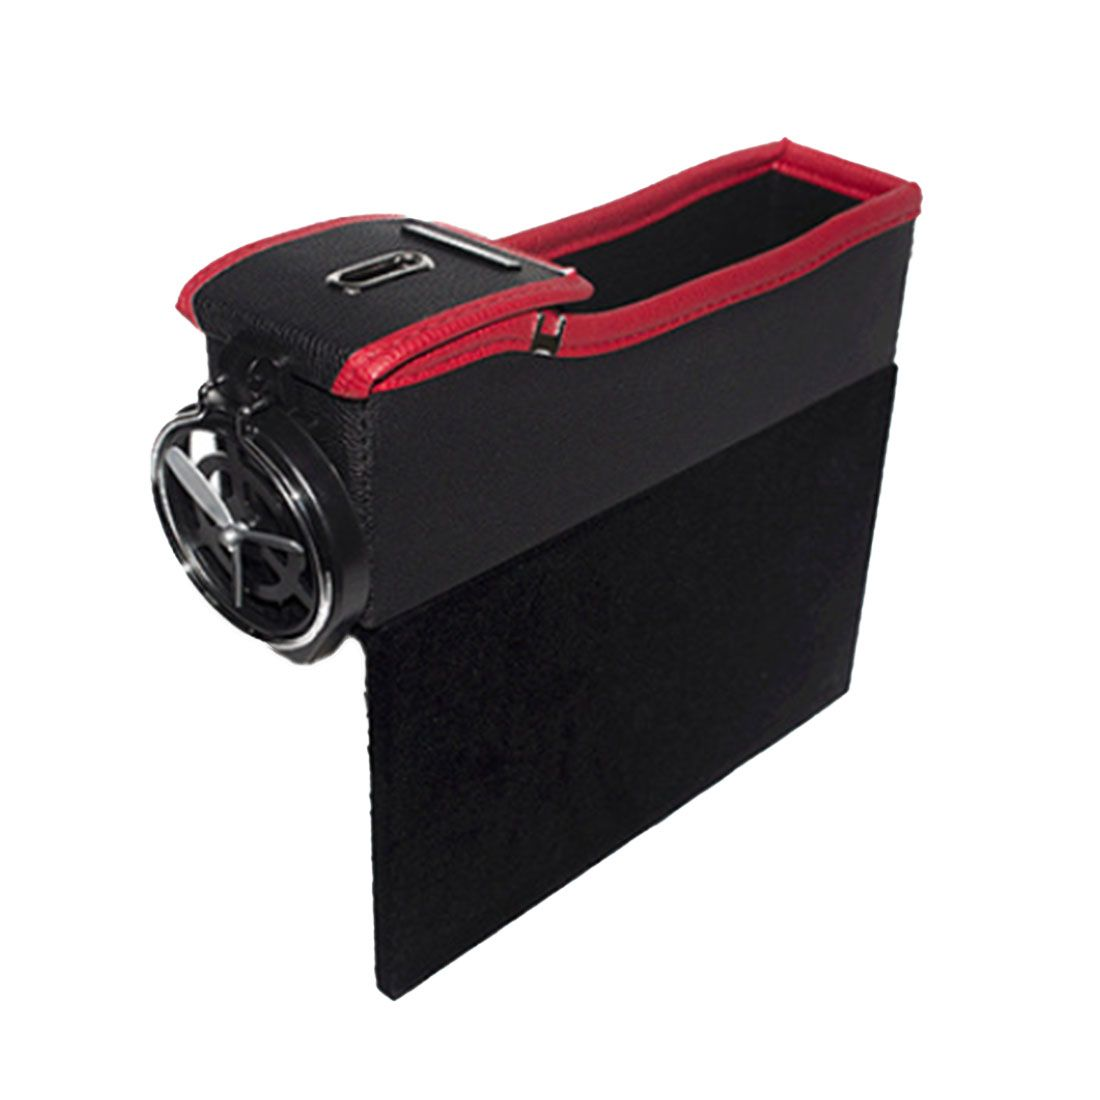 Dewtreetali Car Seat Crevice Storage Box Grain Organizer Gap Slit filler Holder Wallet Phone Coins Cigarette Pocket Accessories